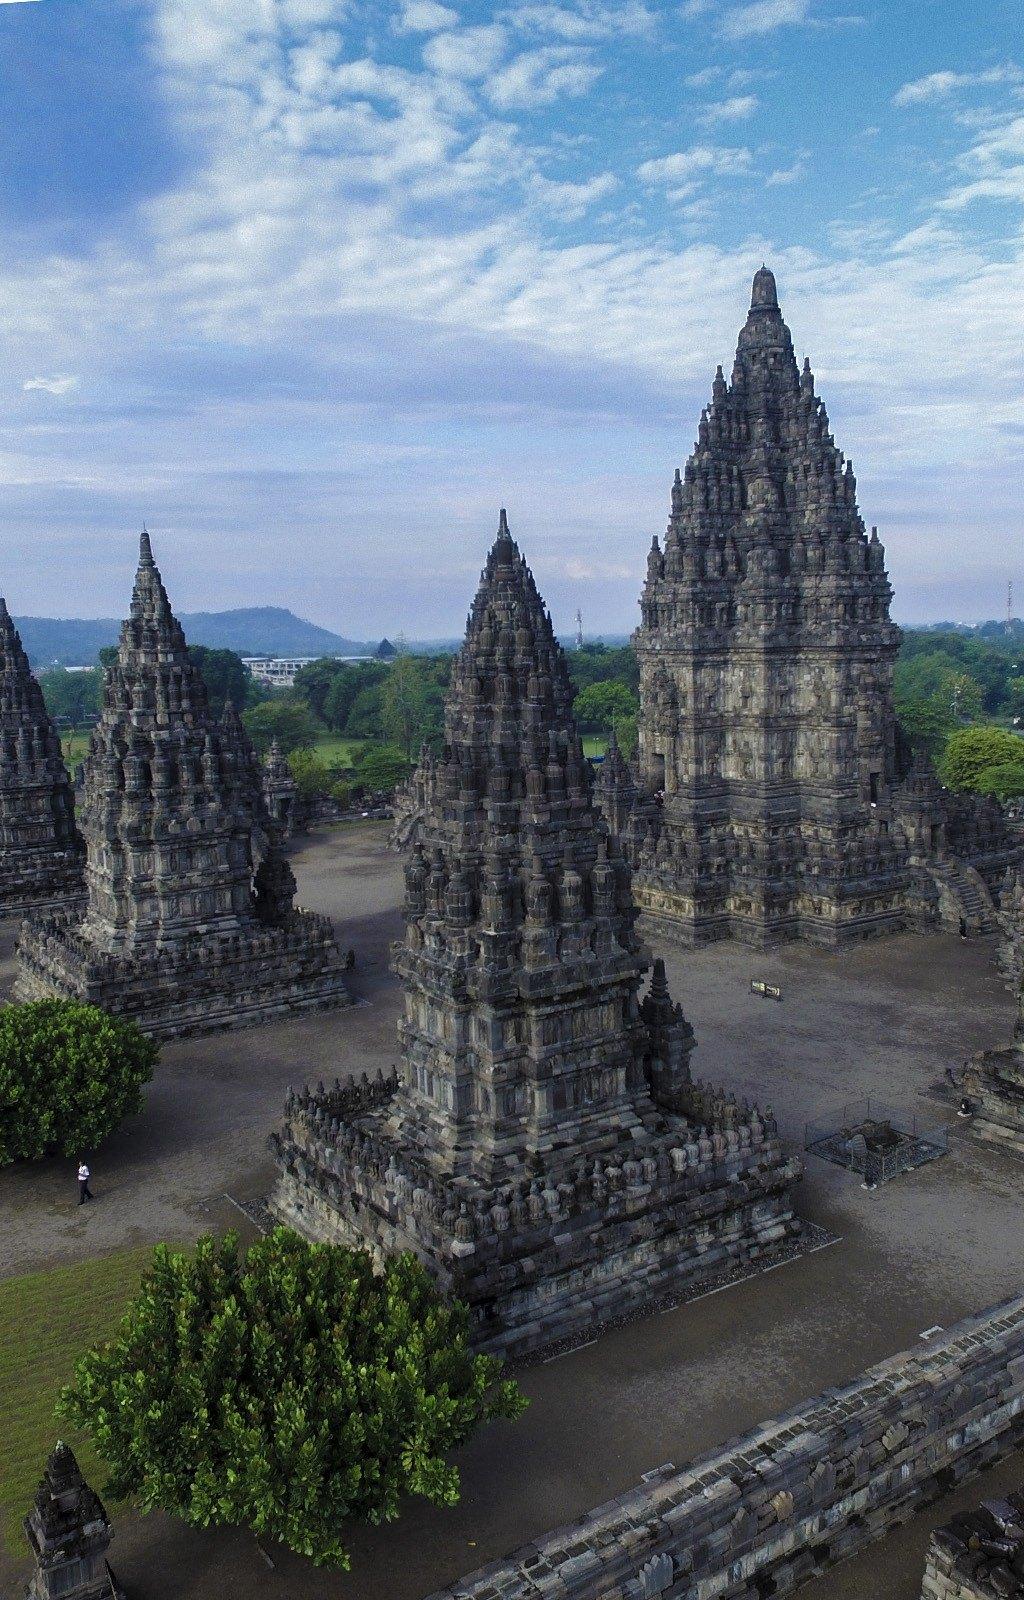 (DOC) 10 Candi Hindu di Indonesia   dienul haq - Academia.edu